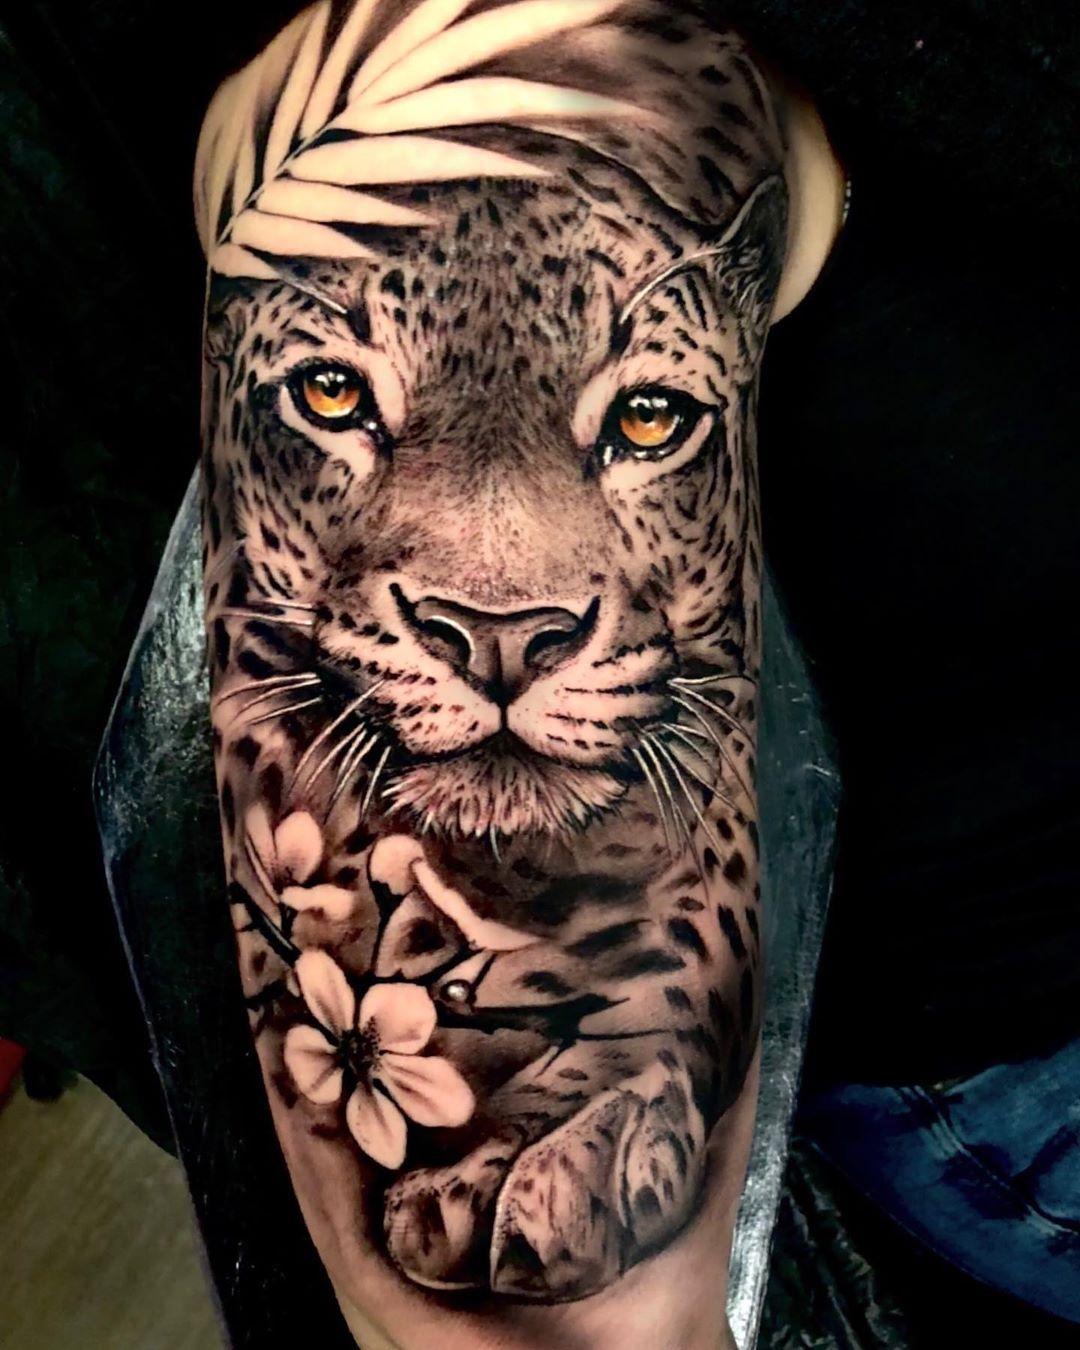 thebesttattooartists,followforfollow,berlin,followmeciudadreal,ciudadreal,tomelloso,almagro,puertollano,tatuajesenpuertollano,tatuajesendaimiel,ciudadrealtattoo,ciudadrealtatuajes,tatuajesciudadreal,follow,ciudadrealtatuajes,puertollano,tattooers,besttattooers,juantabasco,ciudadrealsetatua,ink,tatuajes,realiismo,realistictattoo,ciudadrealtattoo,tatuajesenpuertollano,traditionaltattoos,castillalamancha,ink,tattooart,zurichtattoo,daimiel,inkedgirls,inkig,ink,inktattoosjubn